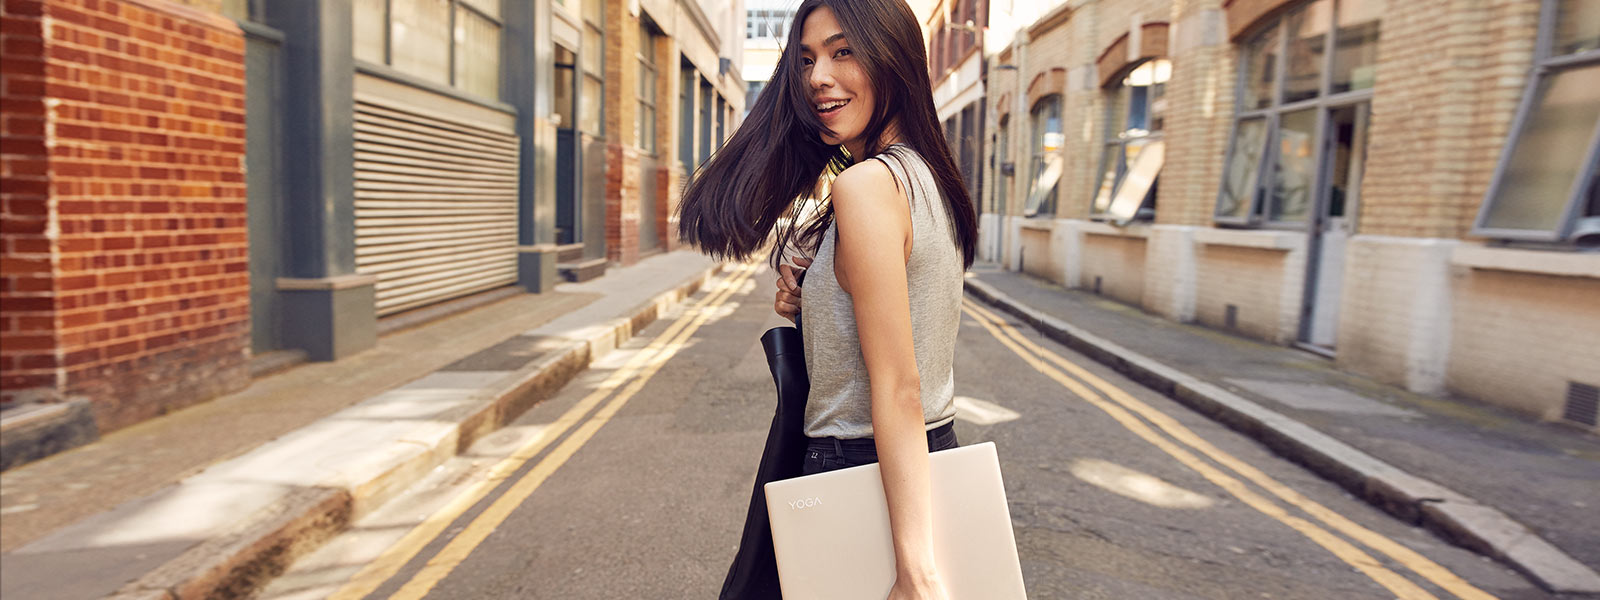 Woman walking down street with Lenovo YOGA 910